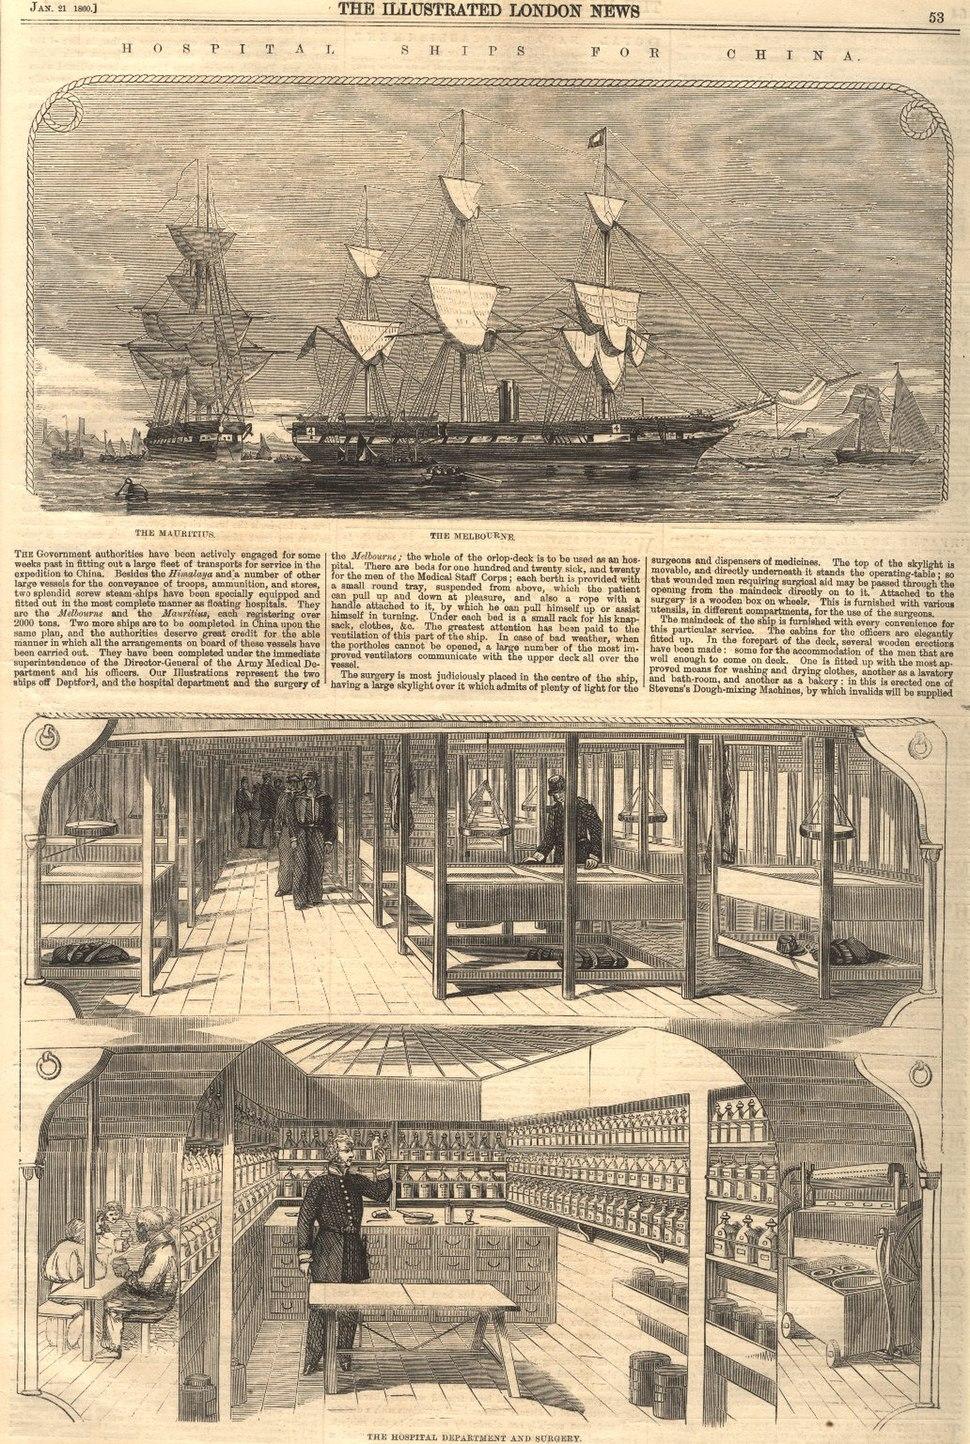 HMS Melbourne